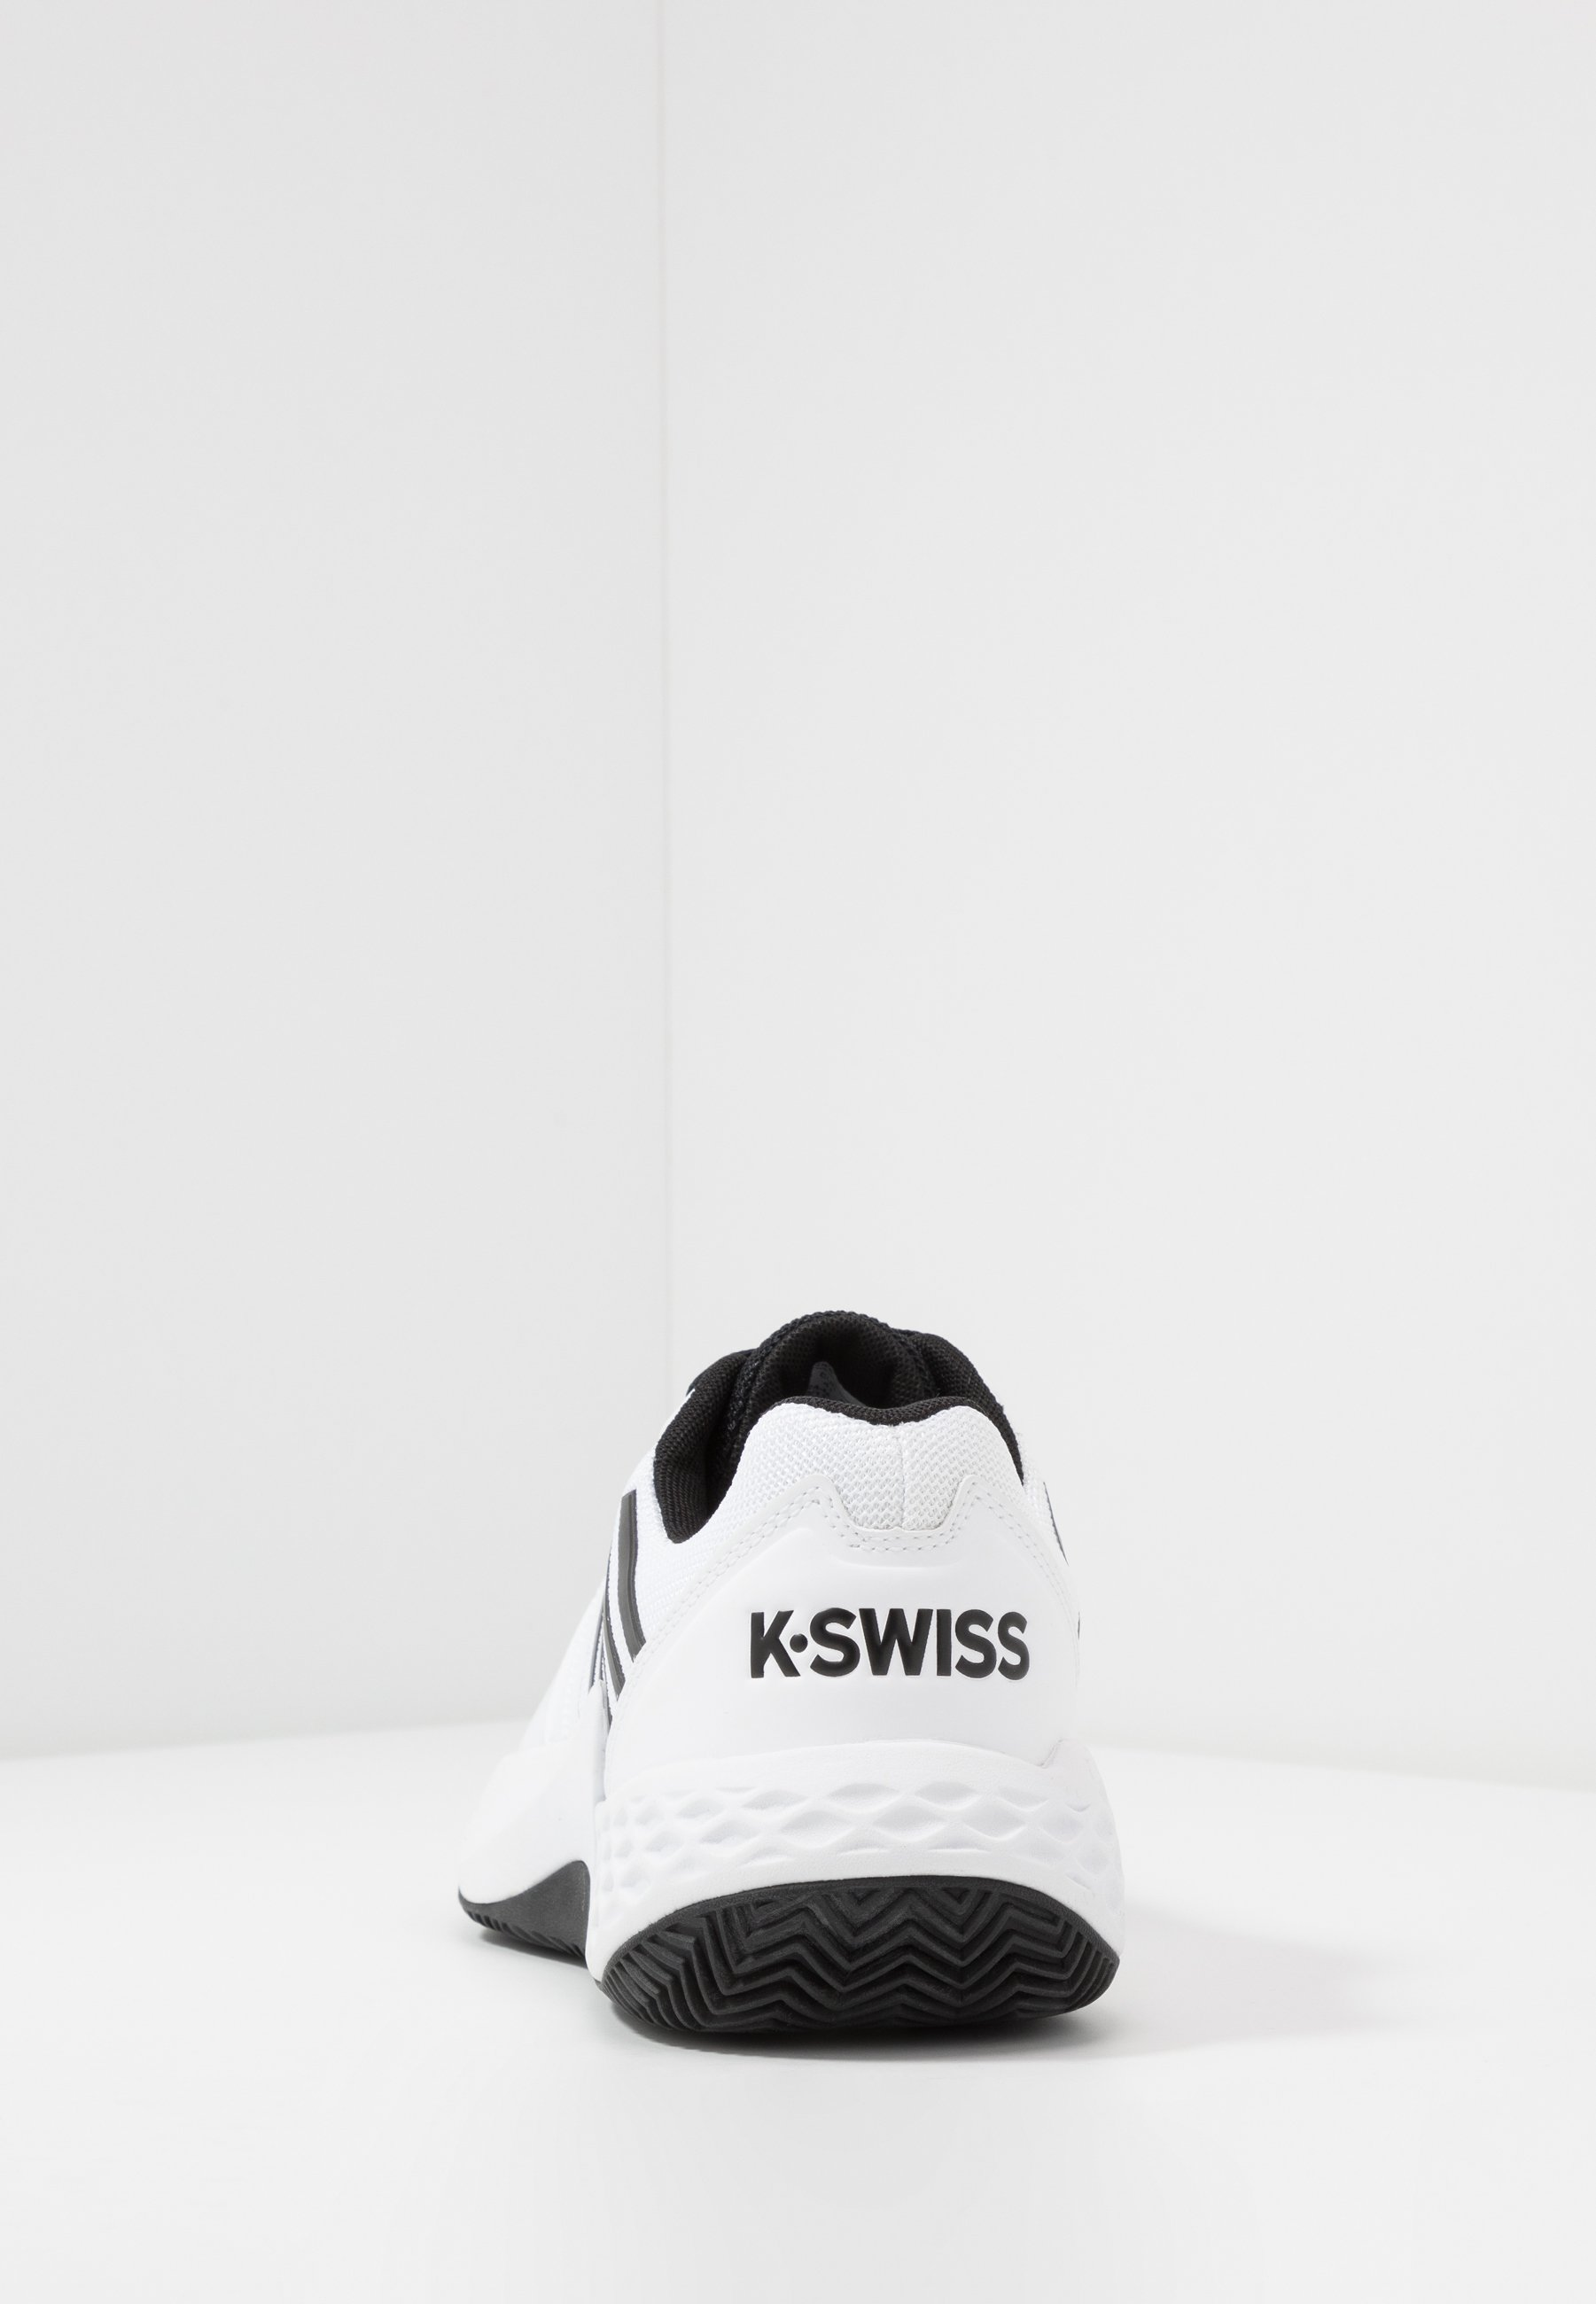 K SWISS AERO COURT HB Clay court tennissko whiteblack